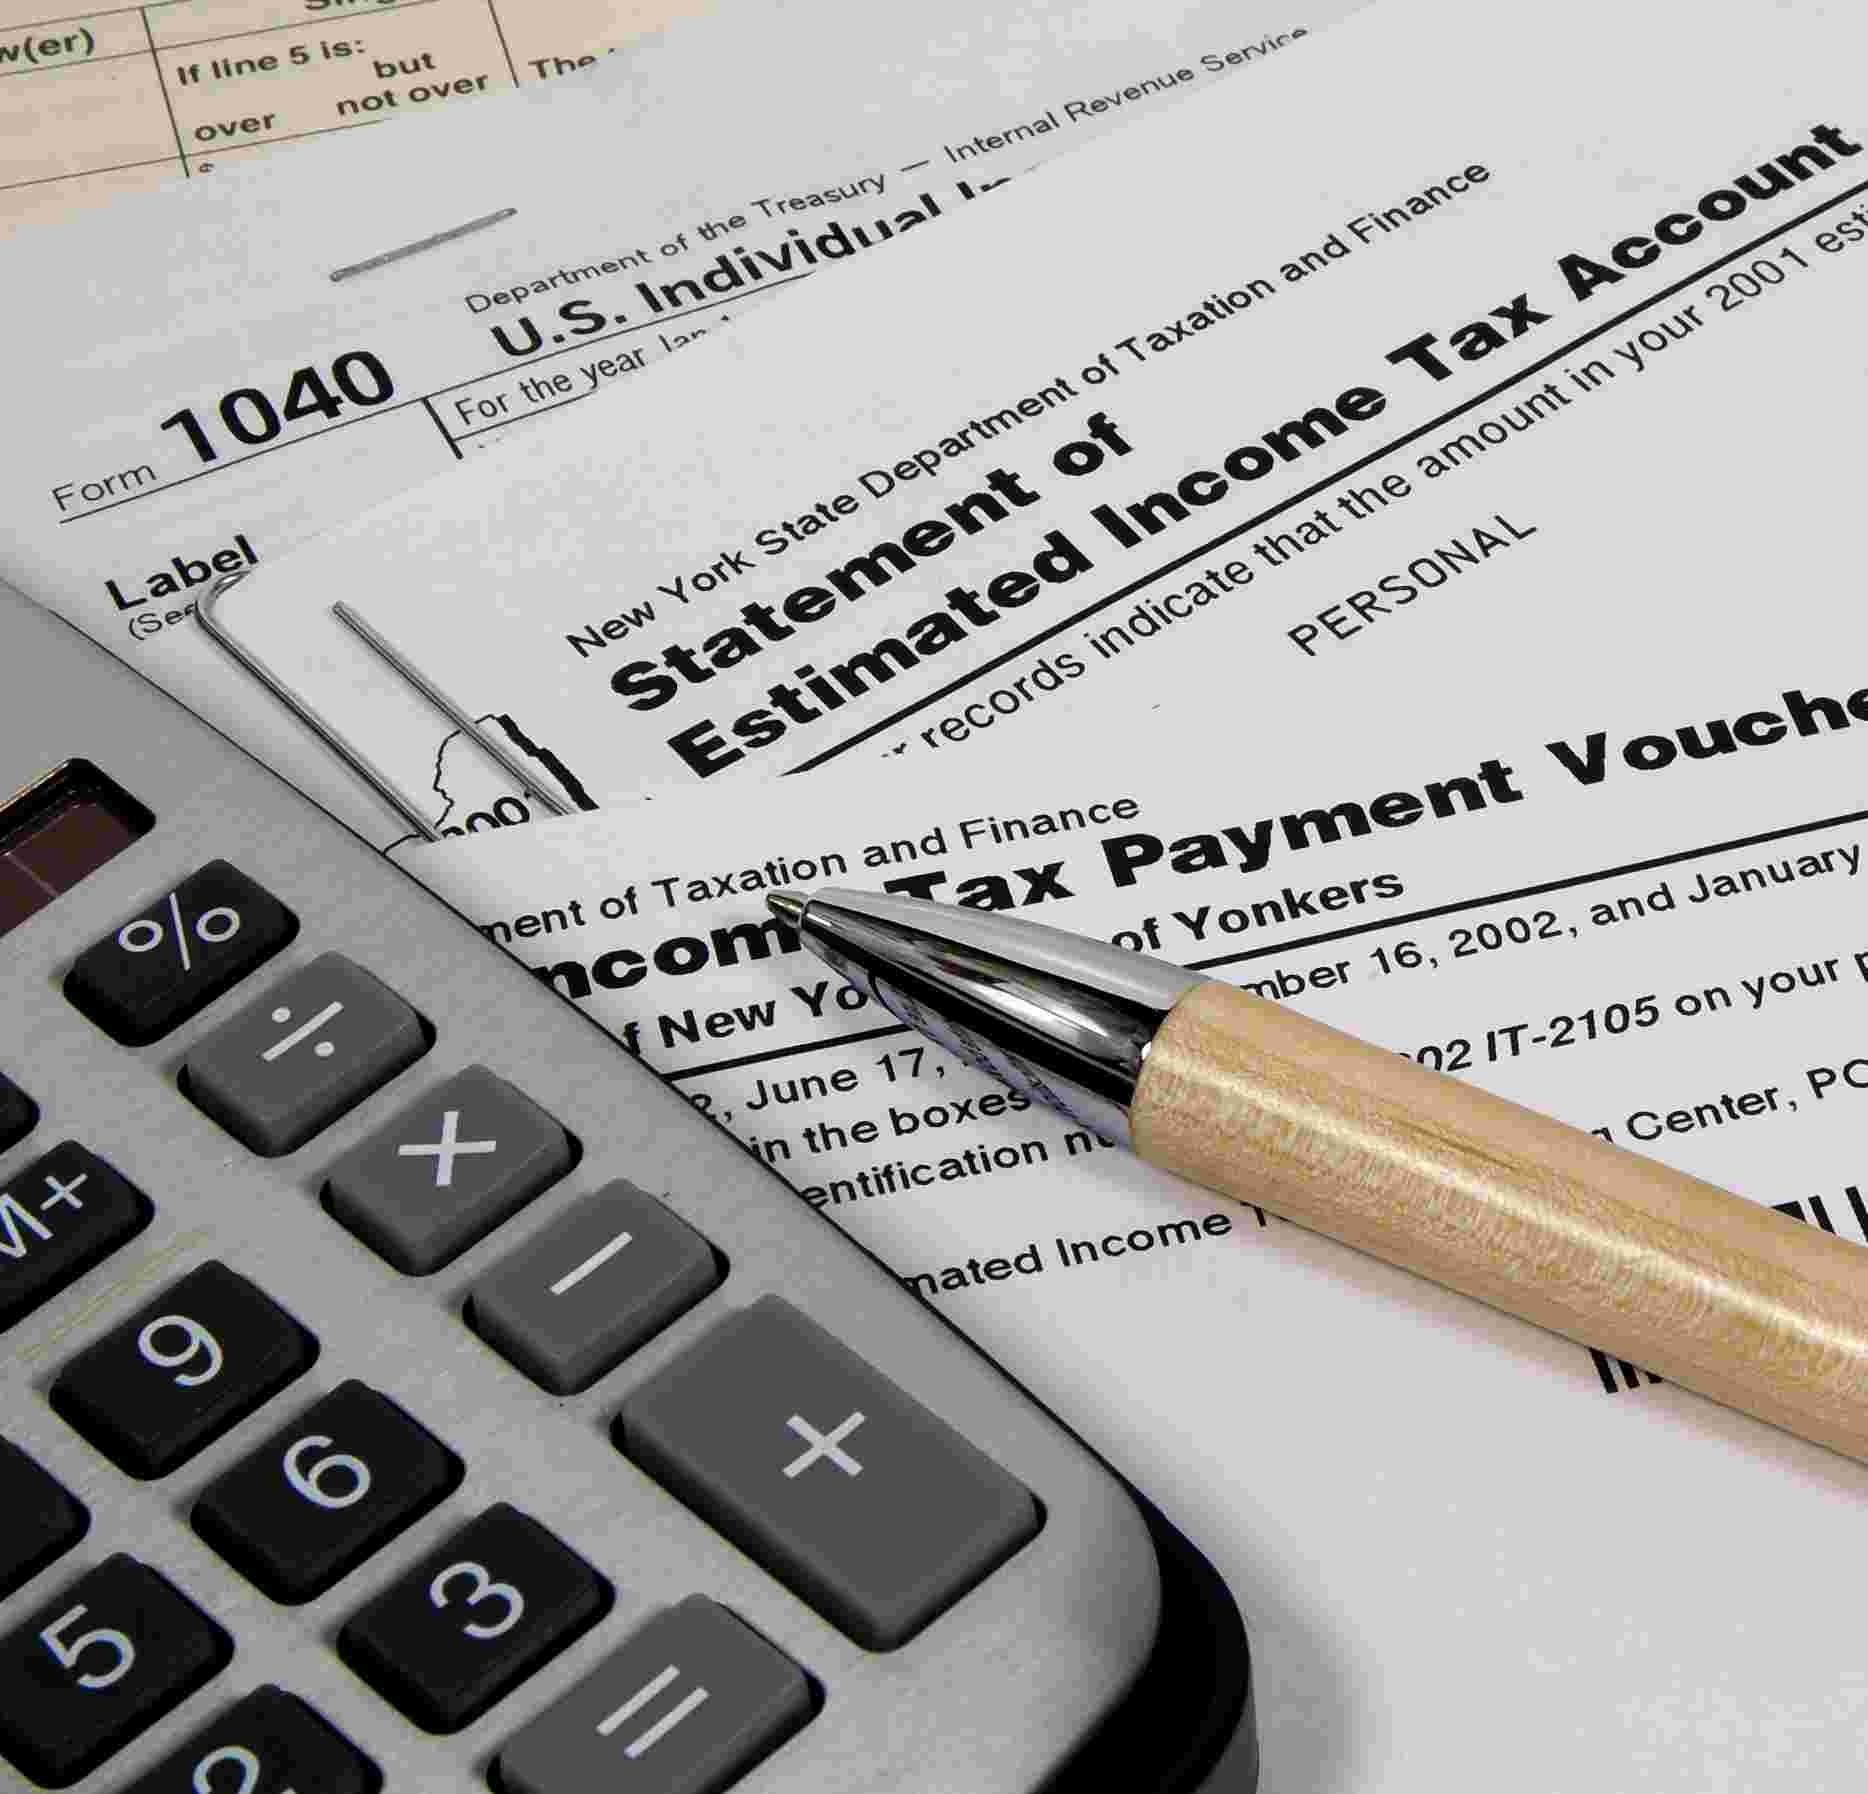 http://www.nazihsidhomcpa.com/tax_filing_accountant_docs_1.jpg